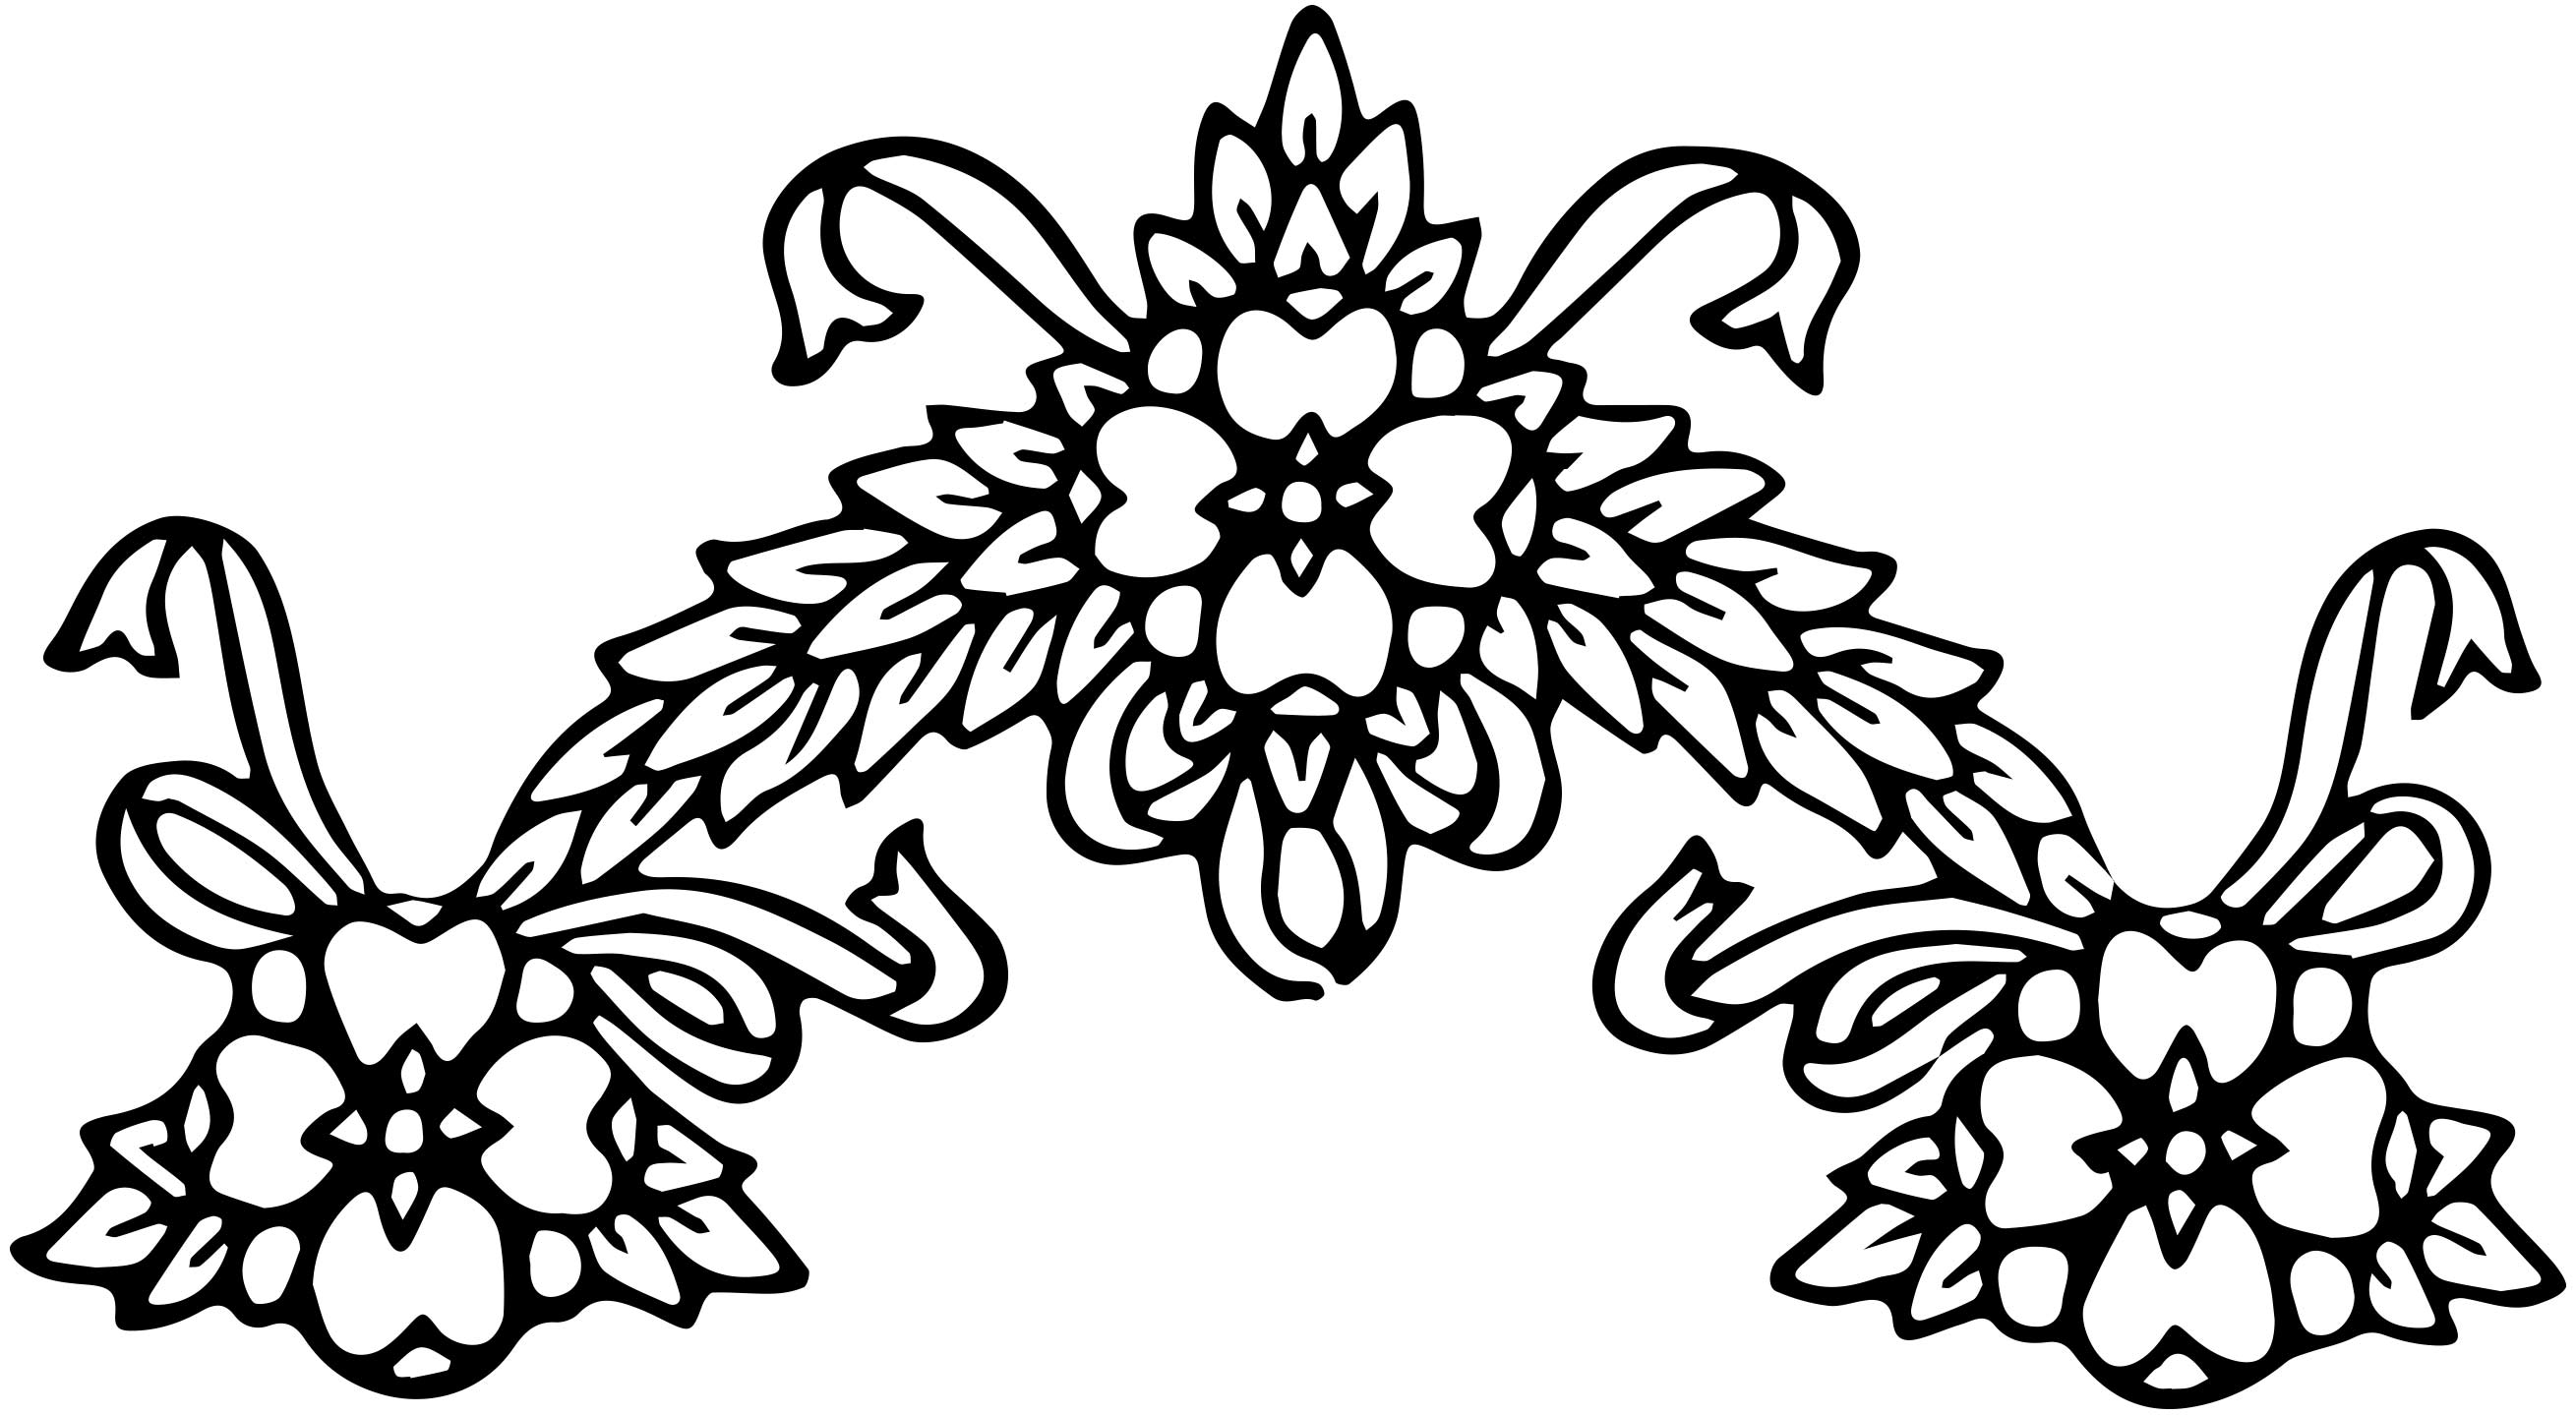 Vintage Floral Wreath Borders Clip Art Image Collection